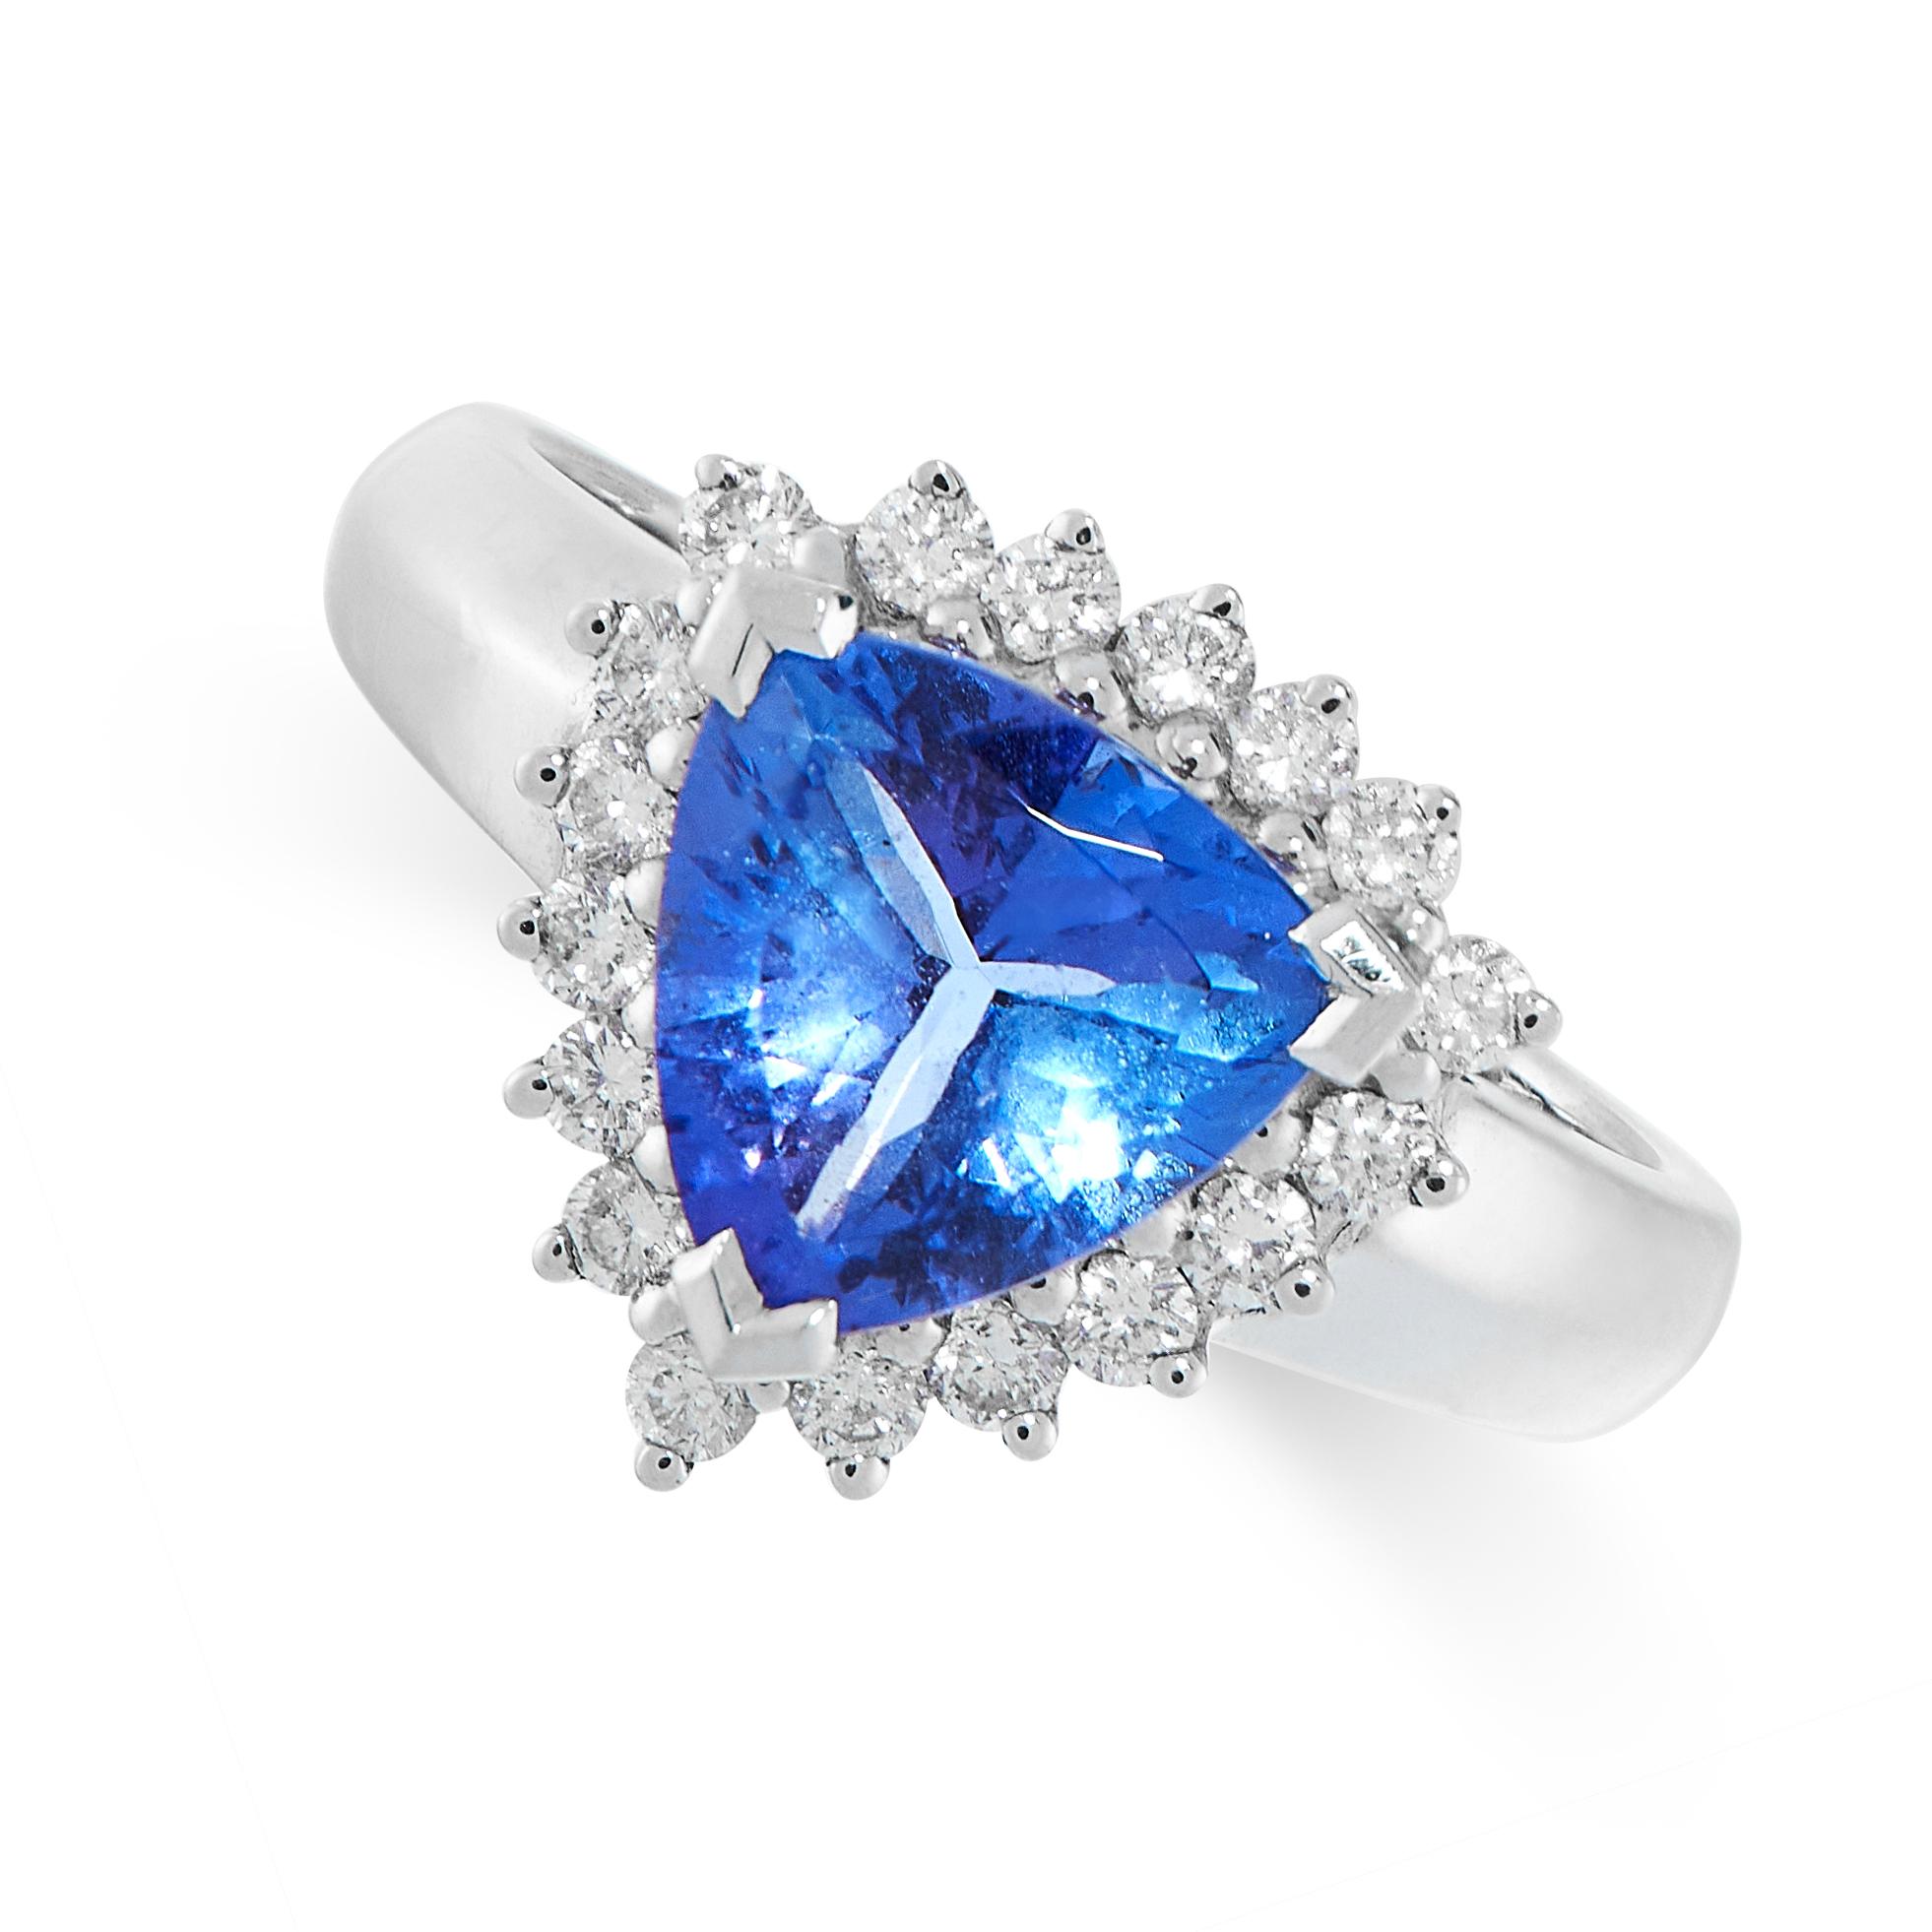 TANZANITE AND DIAMOND RING comprising of a trillion cut tanzanite of 1.92 carats in a border of